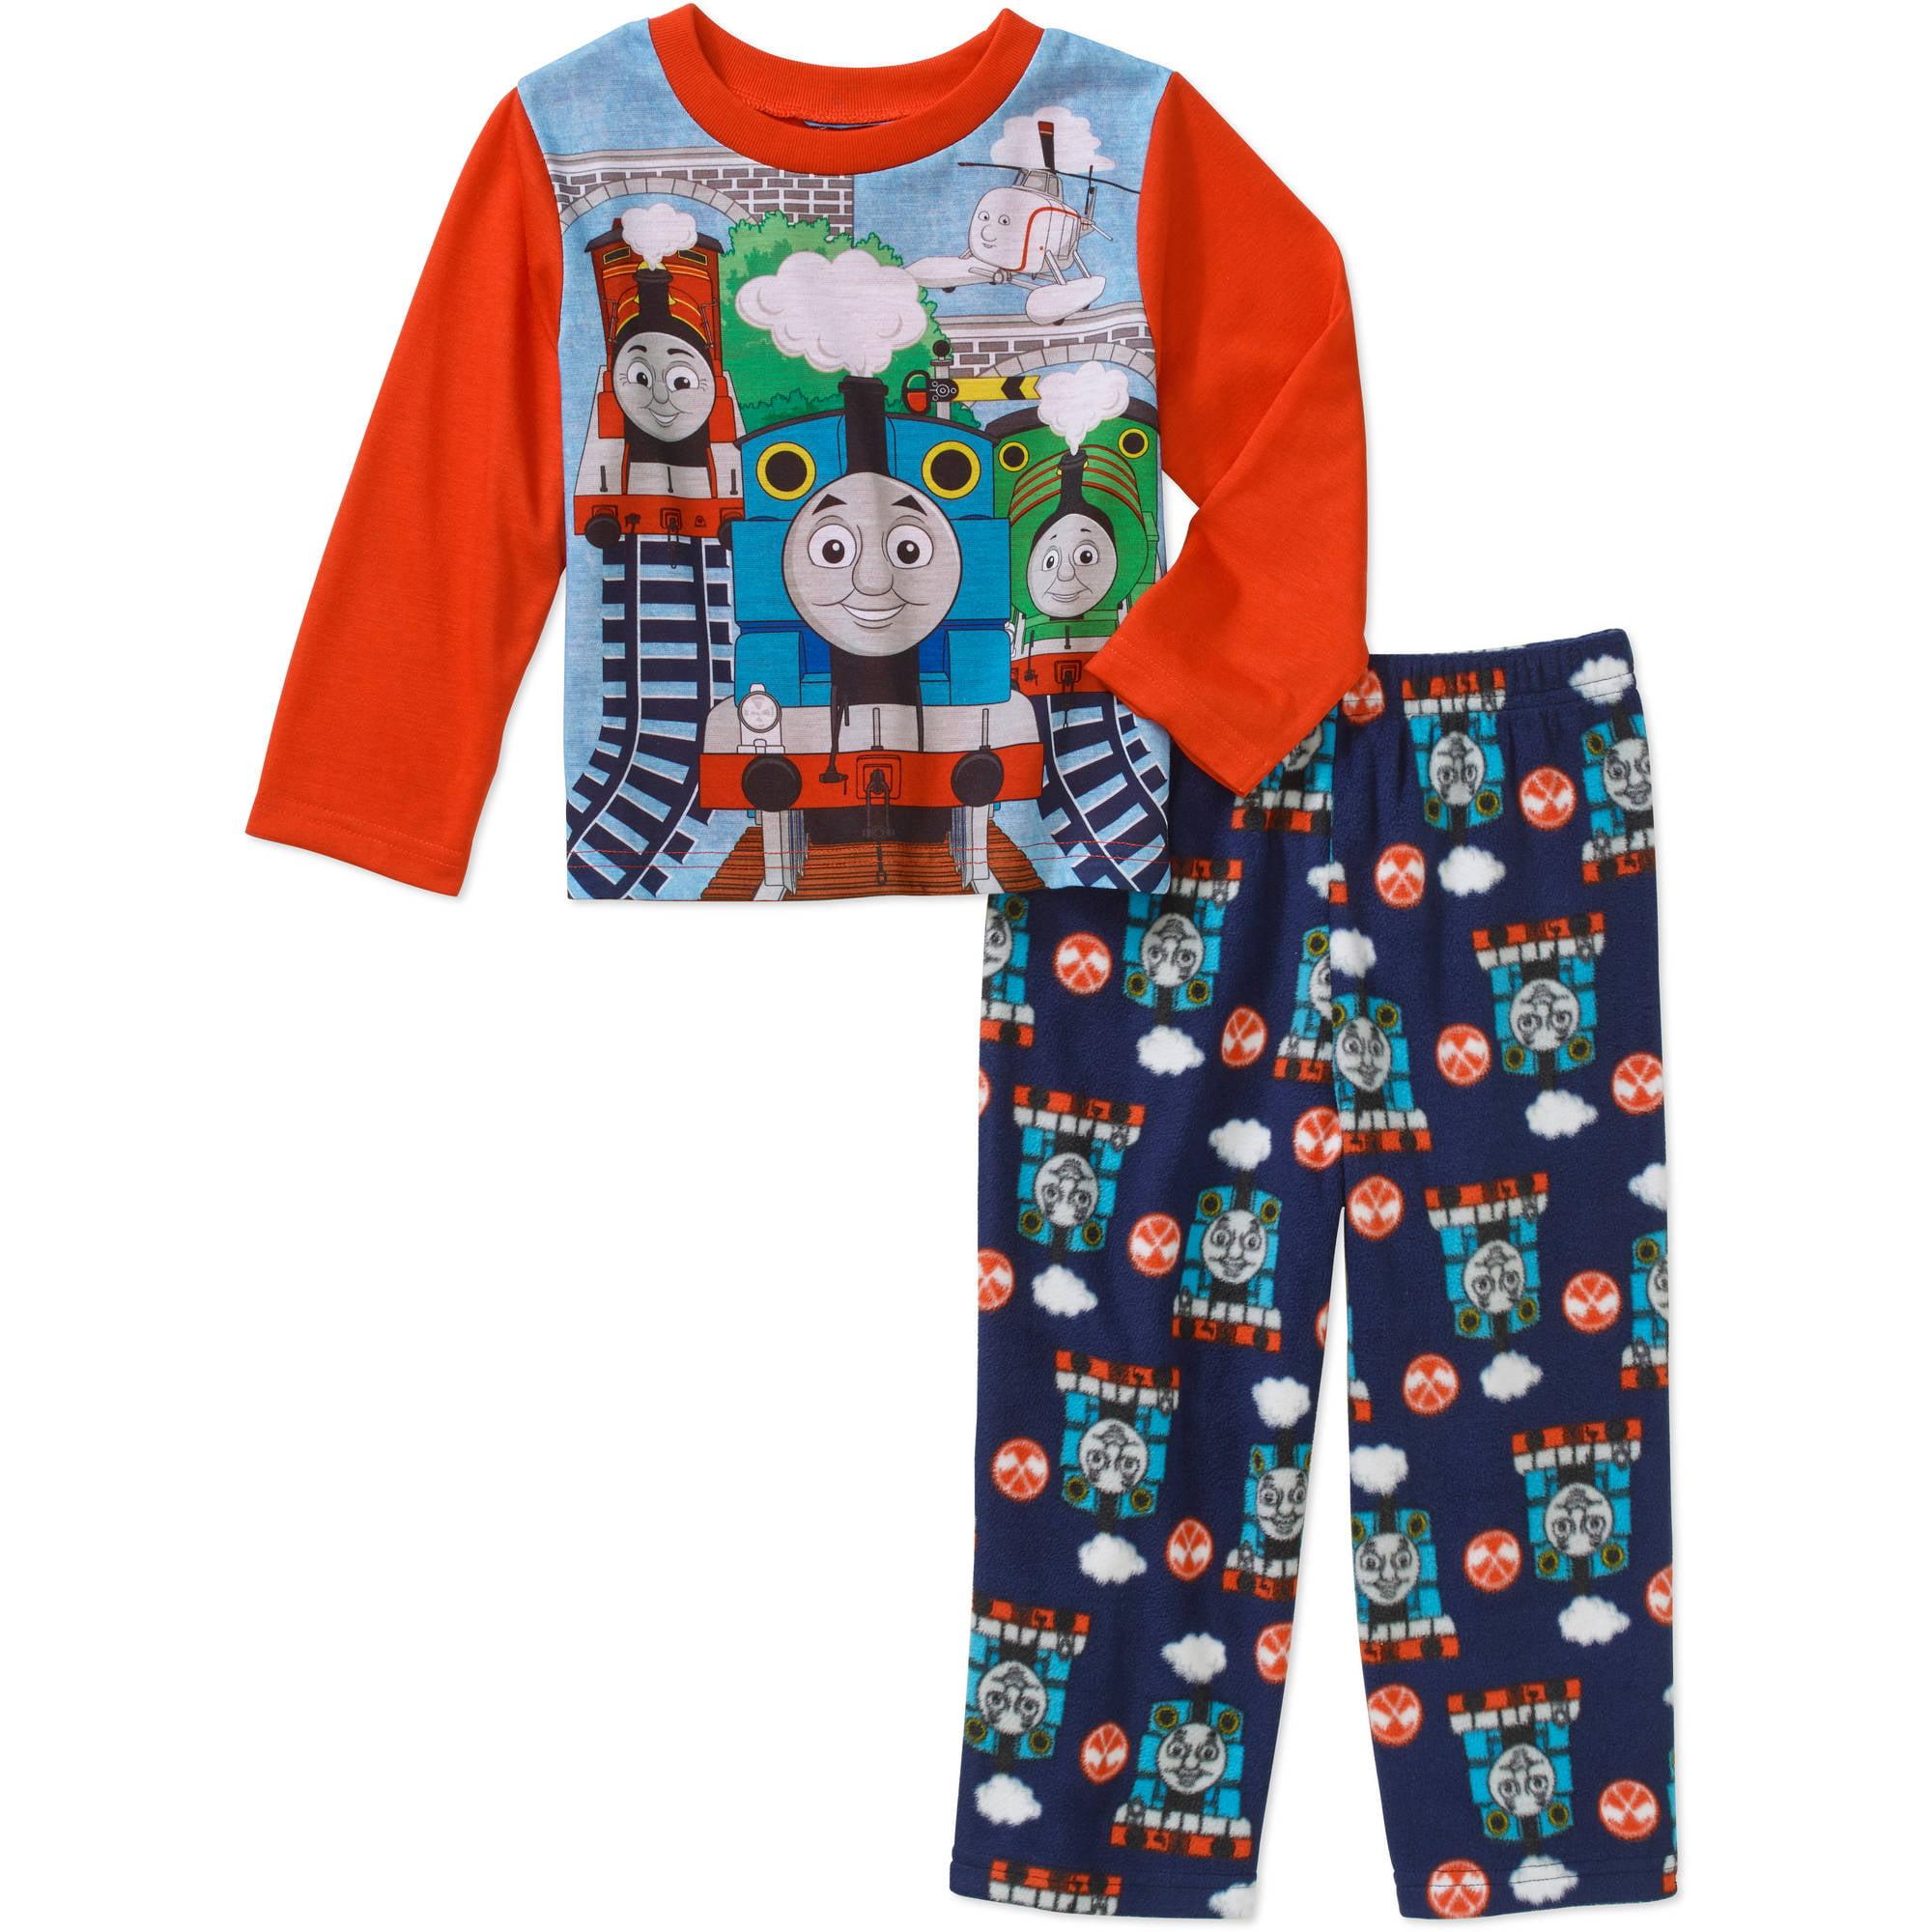 Thomas the Train Toddler Boys' Long Sleeve Top with Fleece Pants Pajama 2-Piece Set